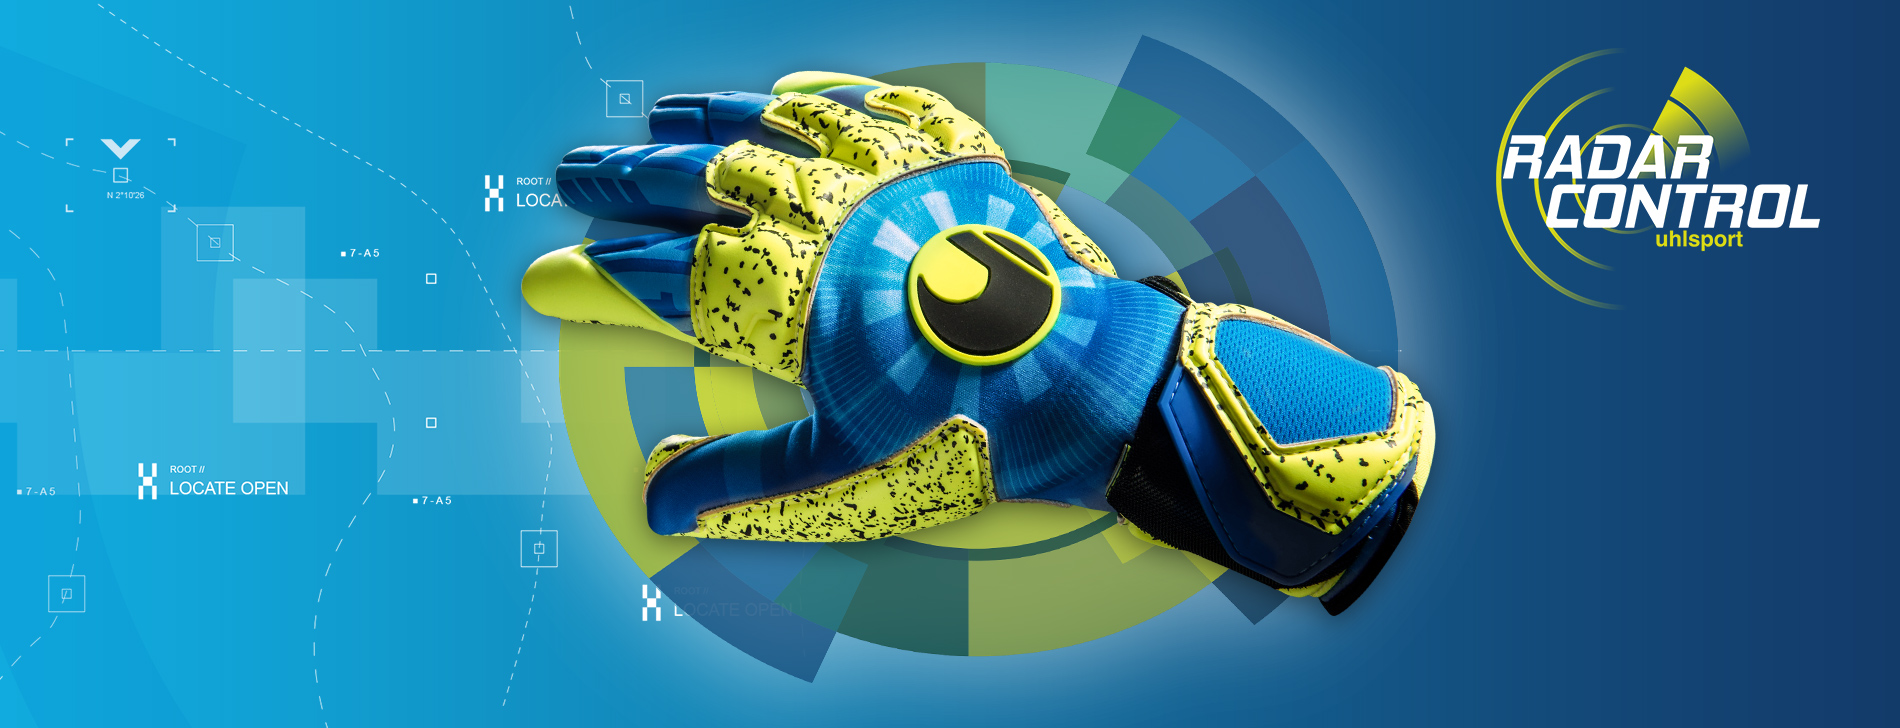 gants de gardien uhlsport radar control